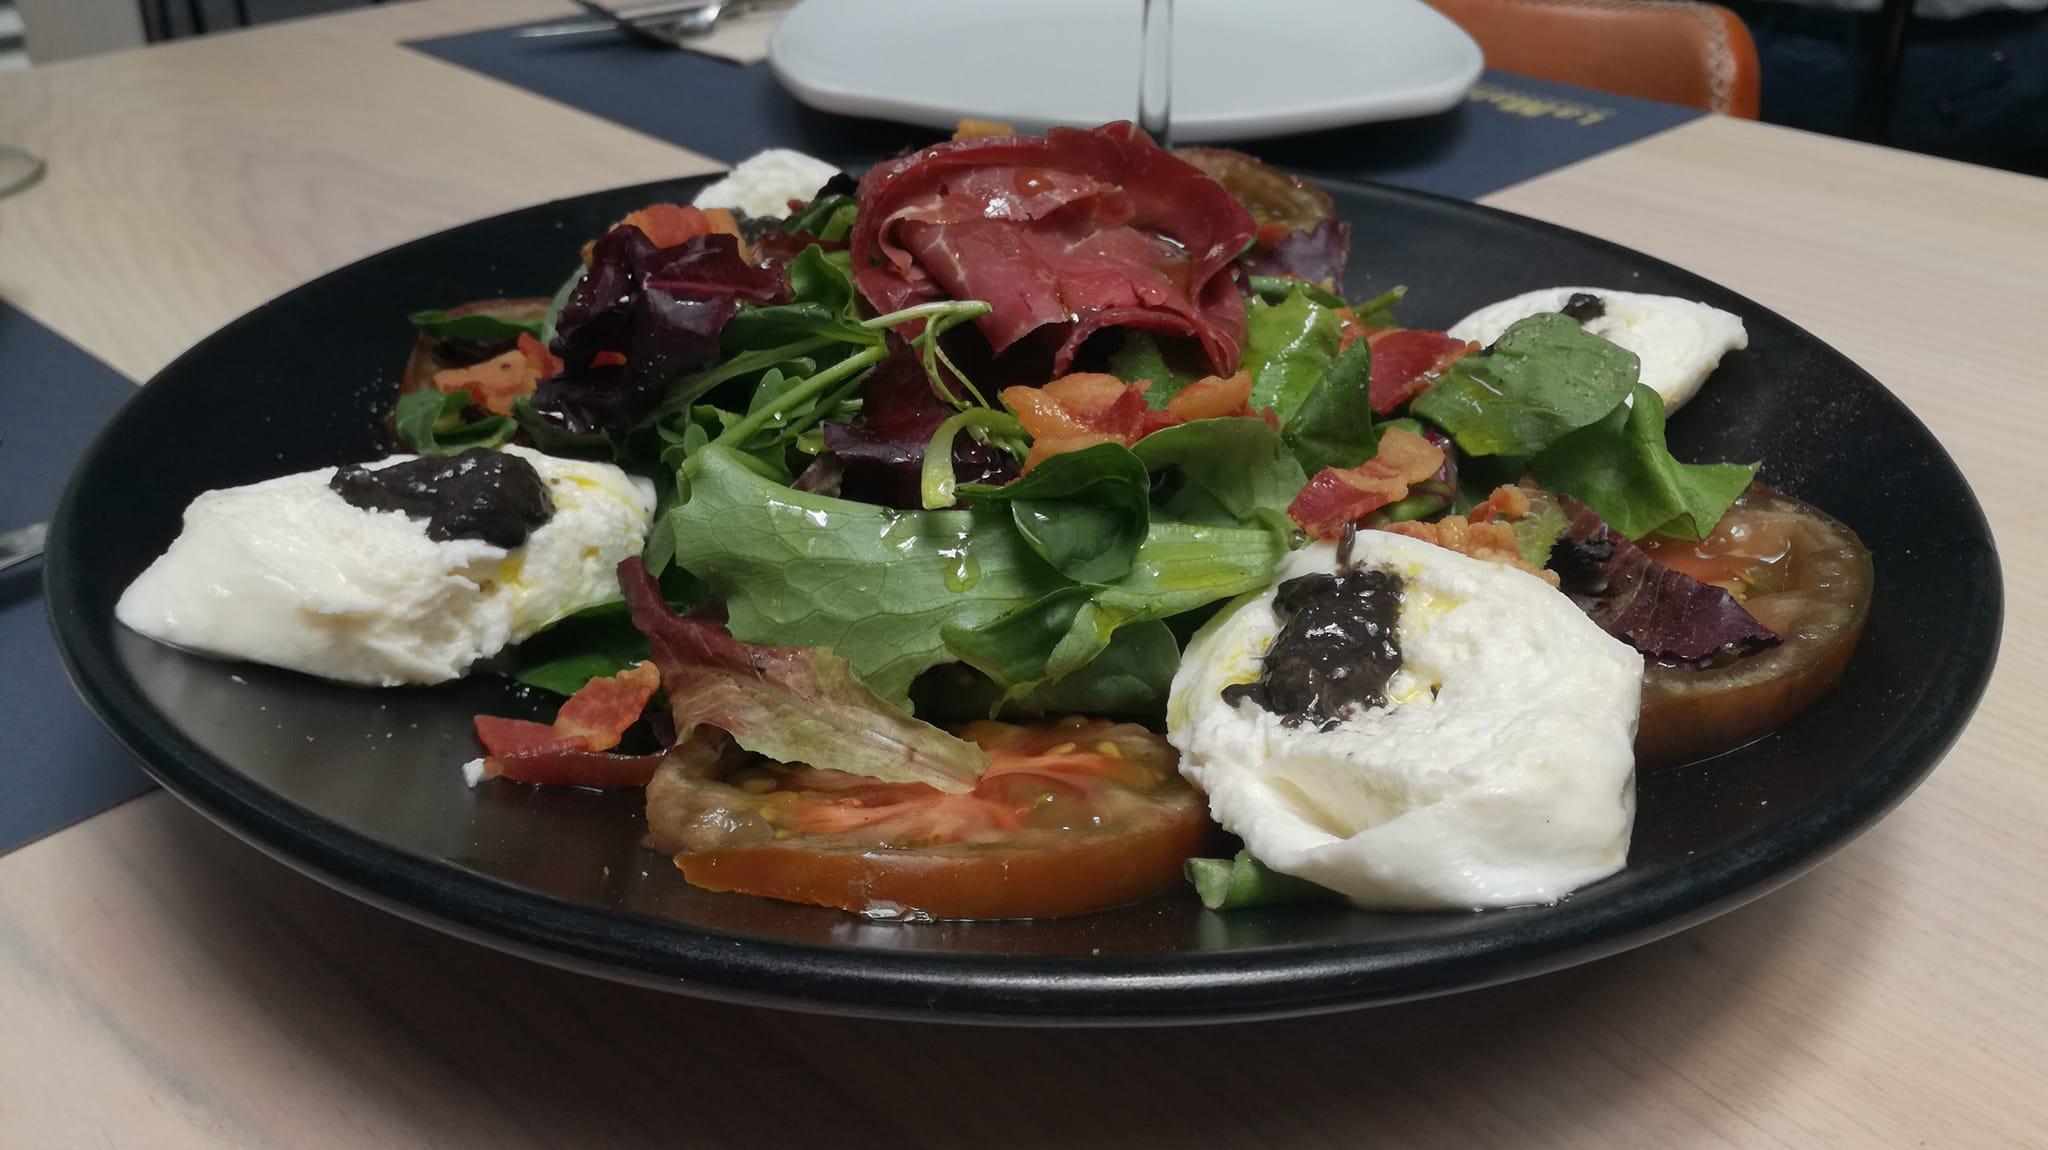 ensalada caprese deliciosa - Insalata Caprese, una deliciosa ensalada con mucha historia